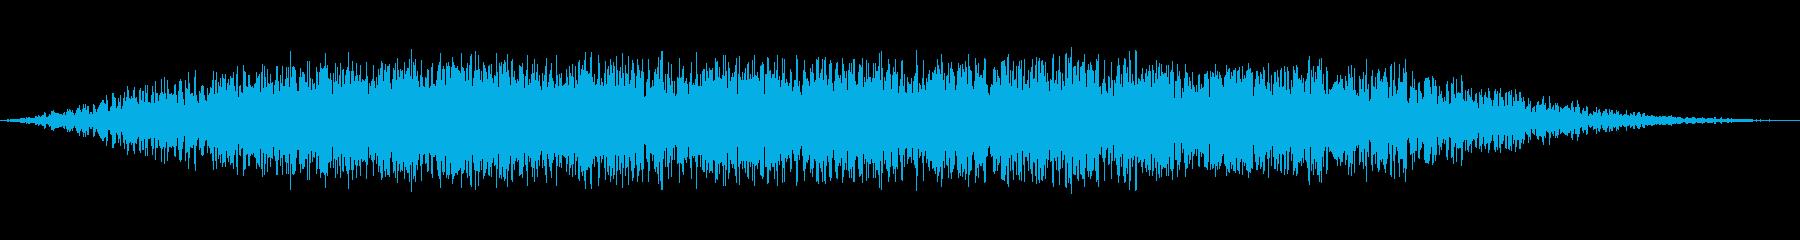 ETHEREAL WORLD 2の再生済みの波形